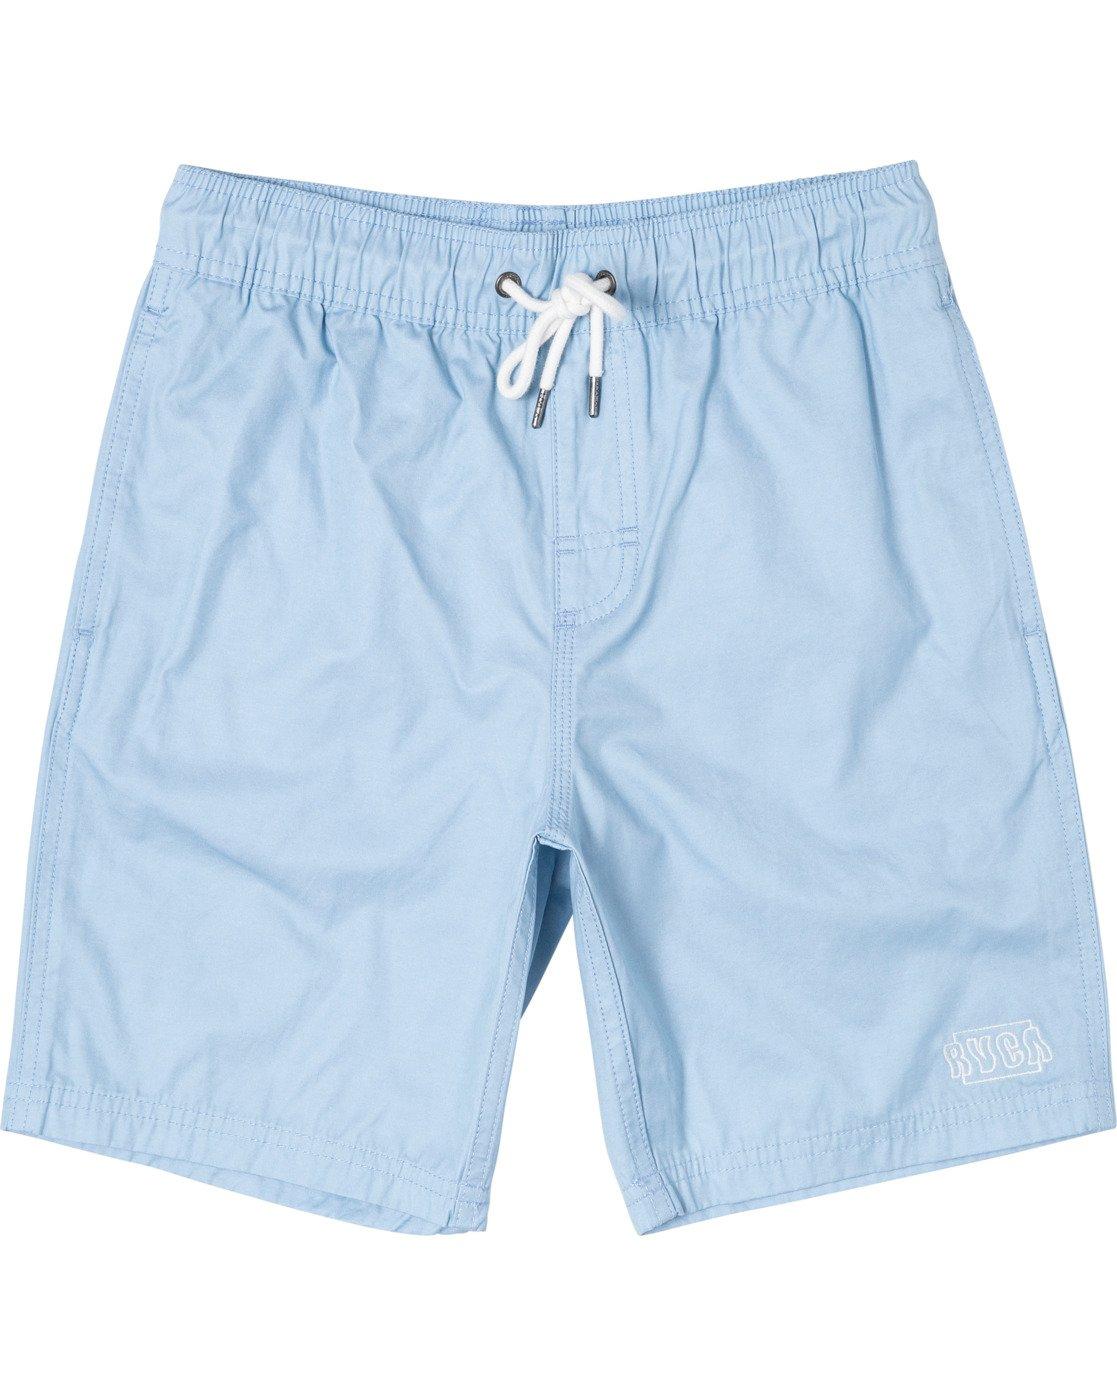 "0 BOYS OPPOSITES ELASTIC SHORT 16"" Blue B1051ROE RVCA"